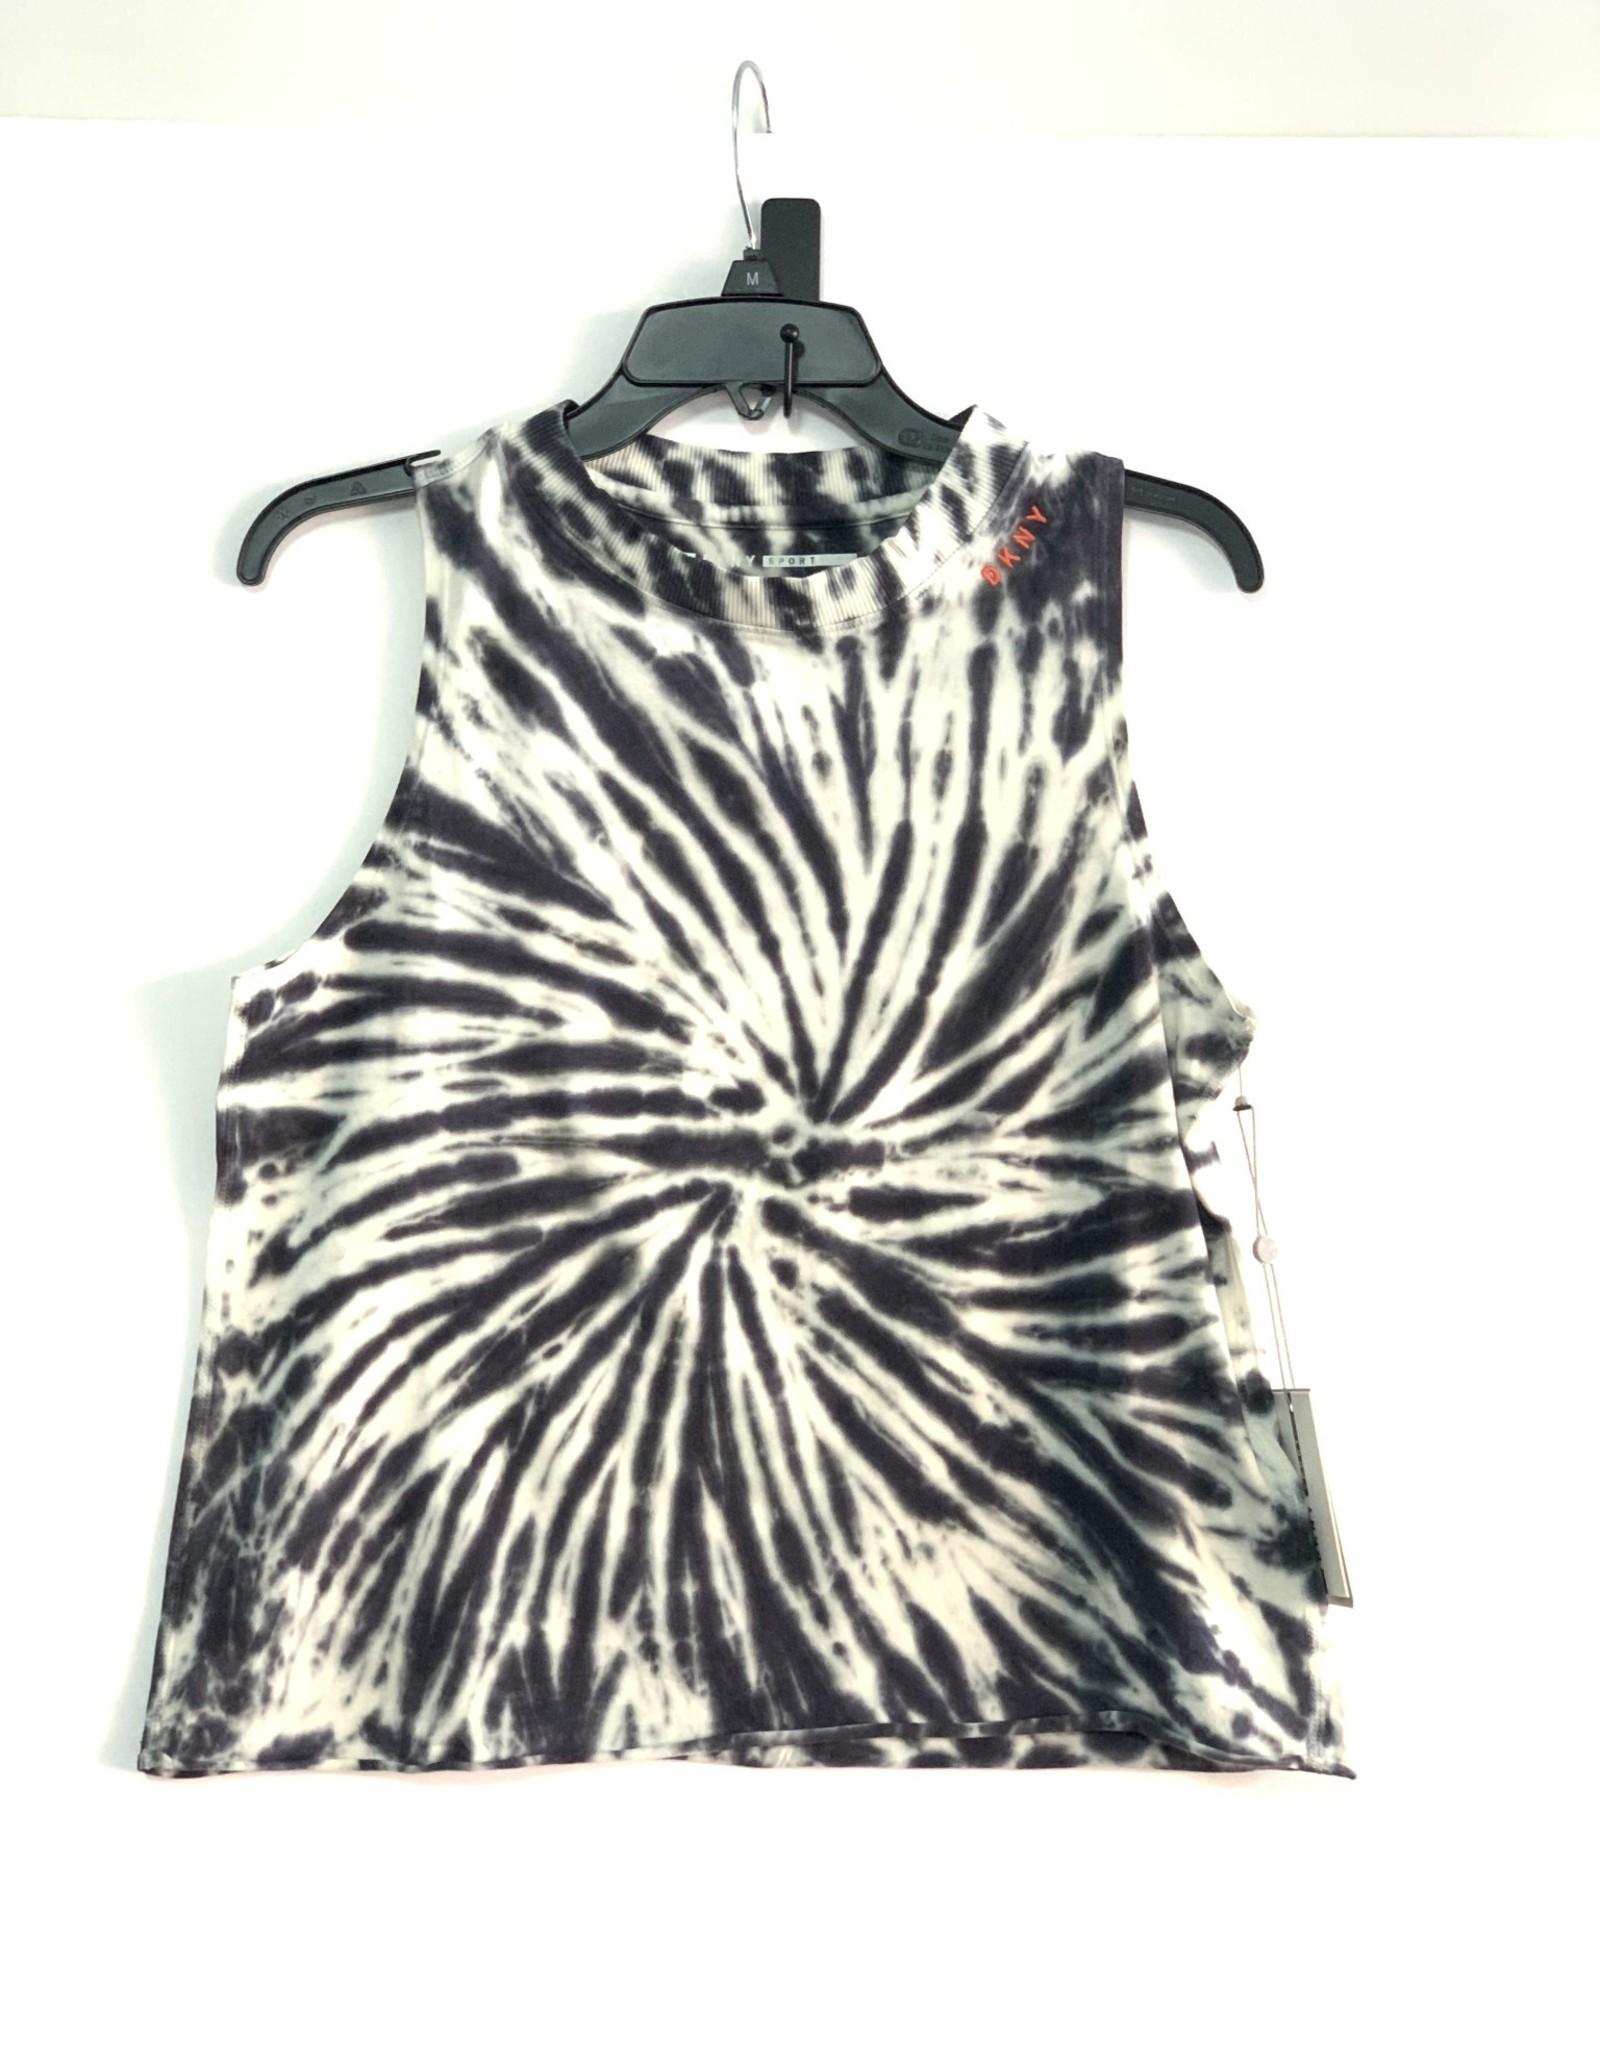 DKNY DKNY Tank Shirt Tie Dye